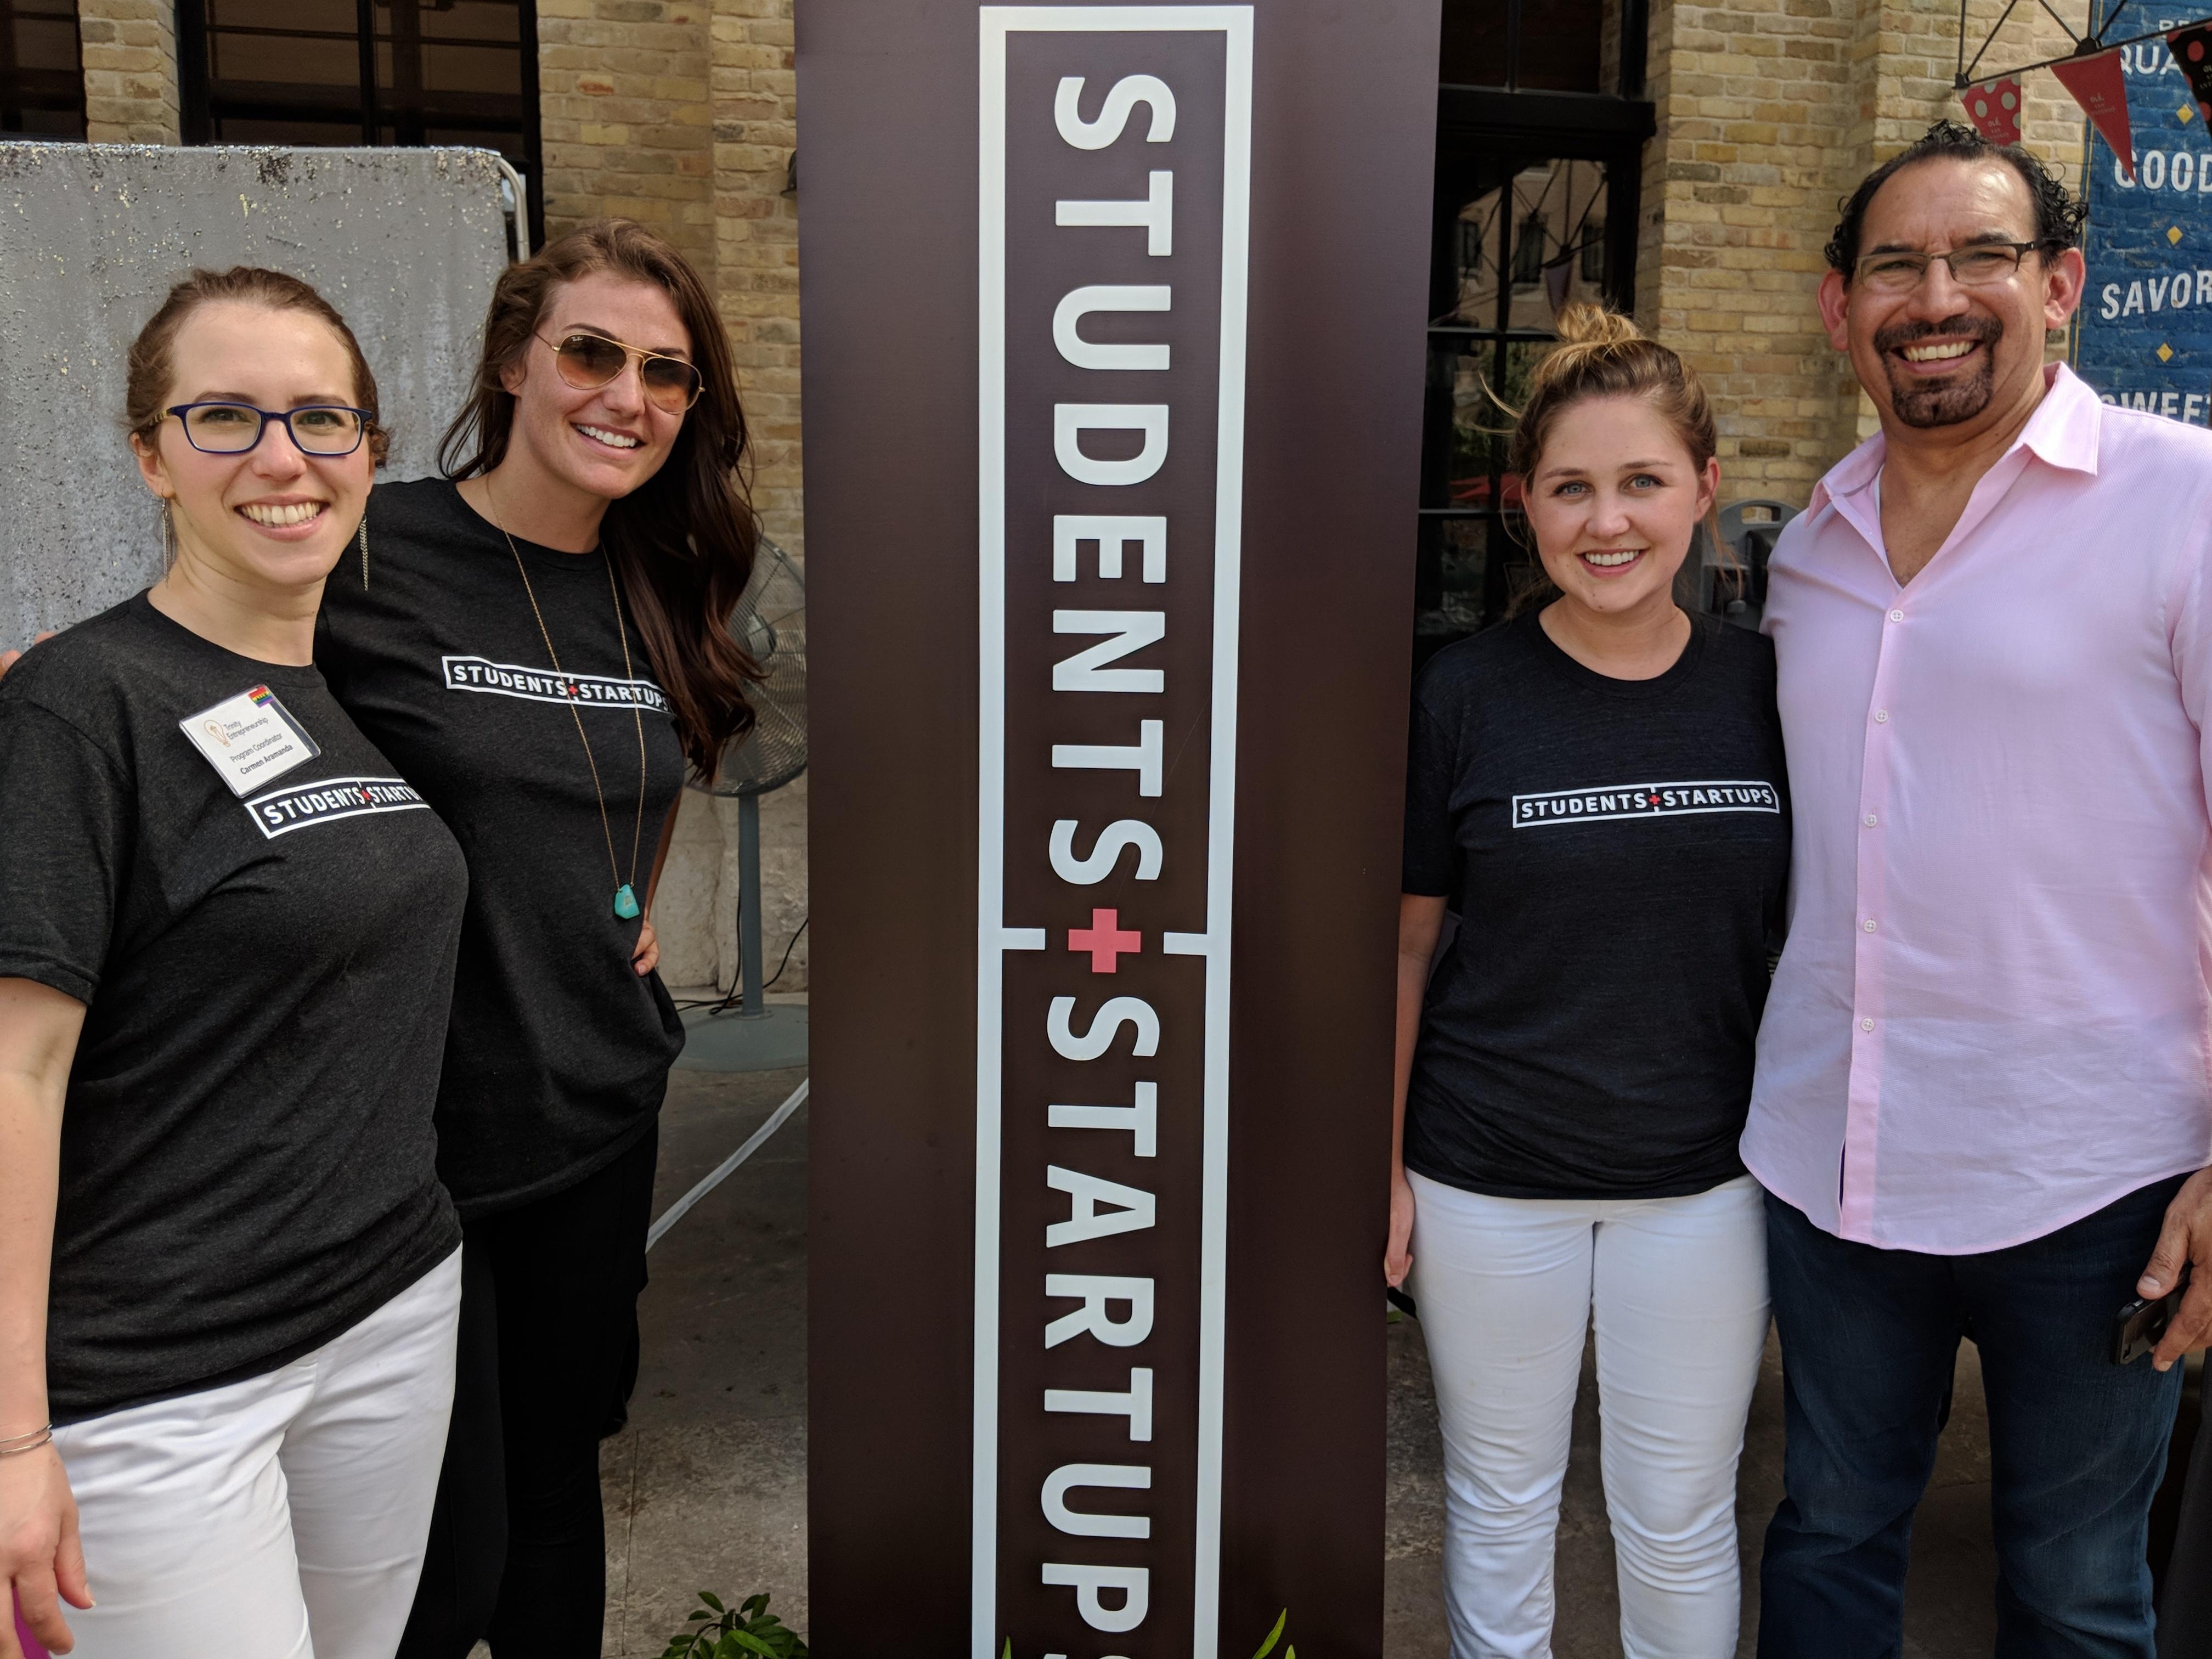 From left, Carmen Aramanda, Alex Fry, Ashley Uptmore, and Luis Martinez form the team overseeing Students+Startups at Trinity University. Photo credit: Startups San Antonio.